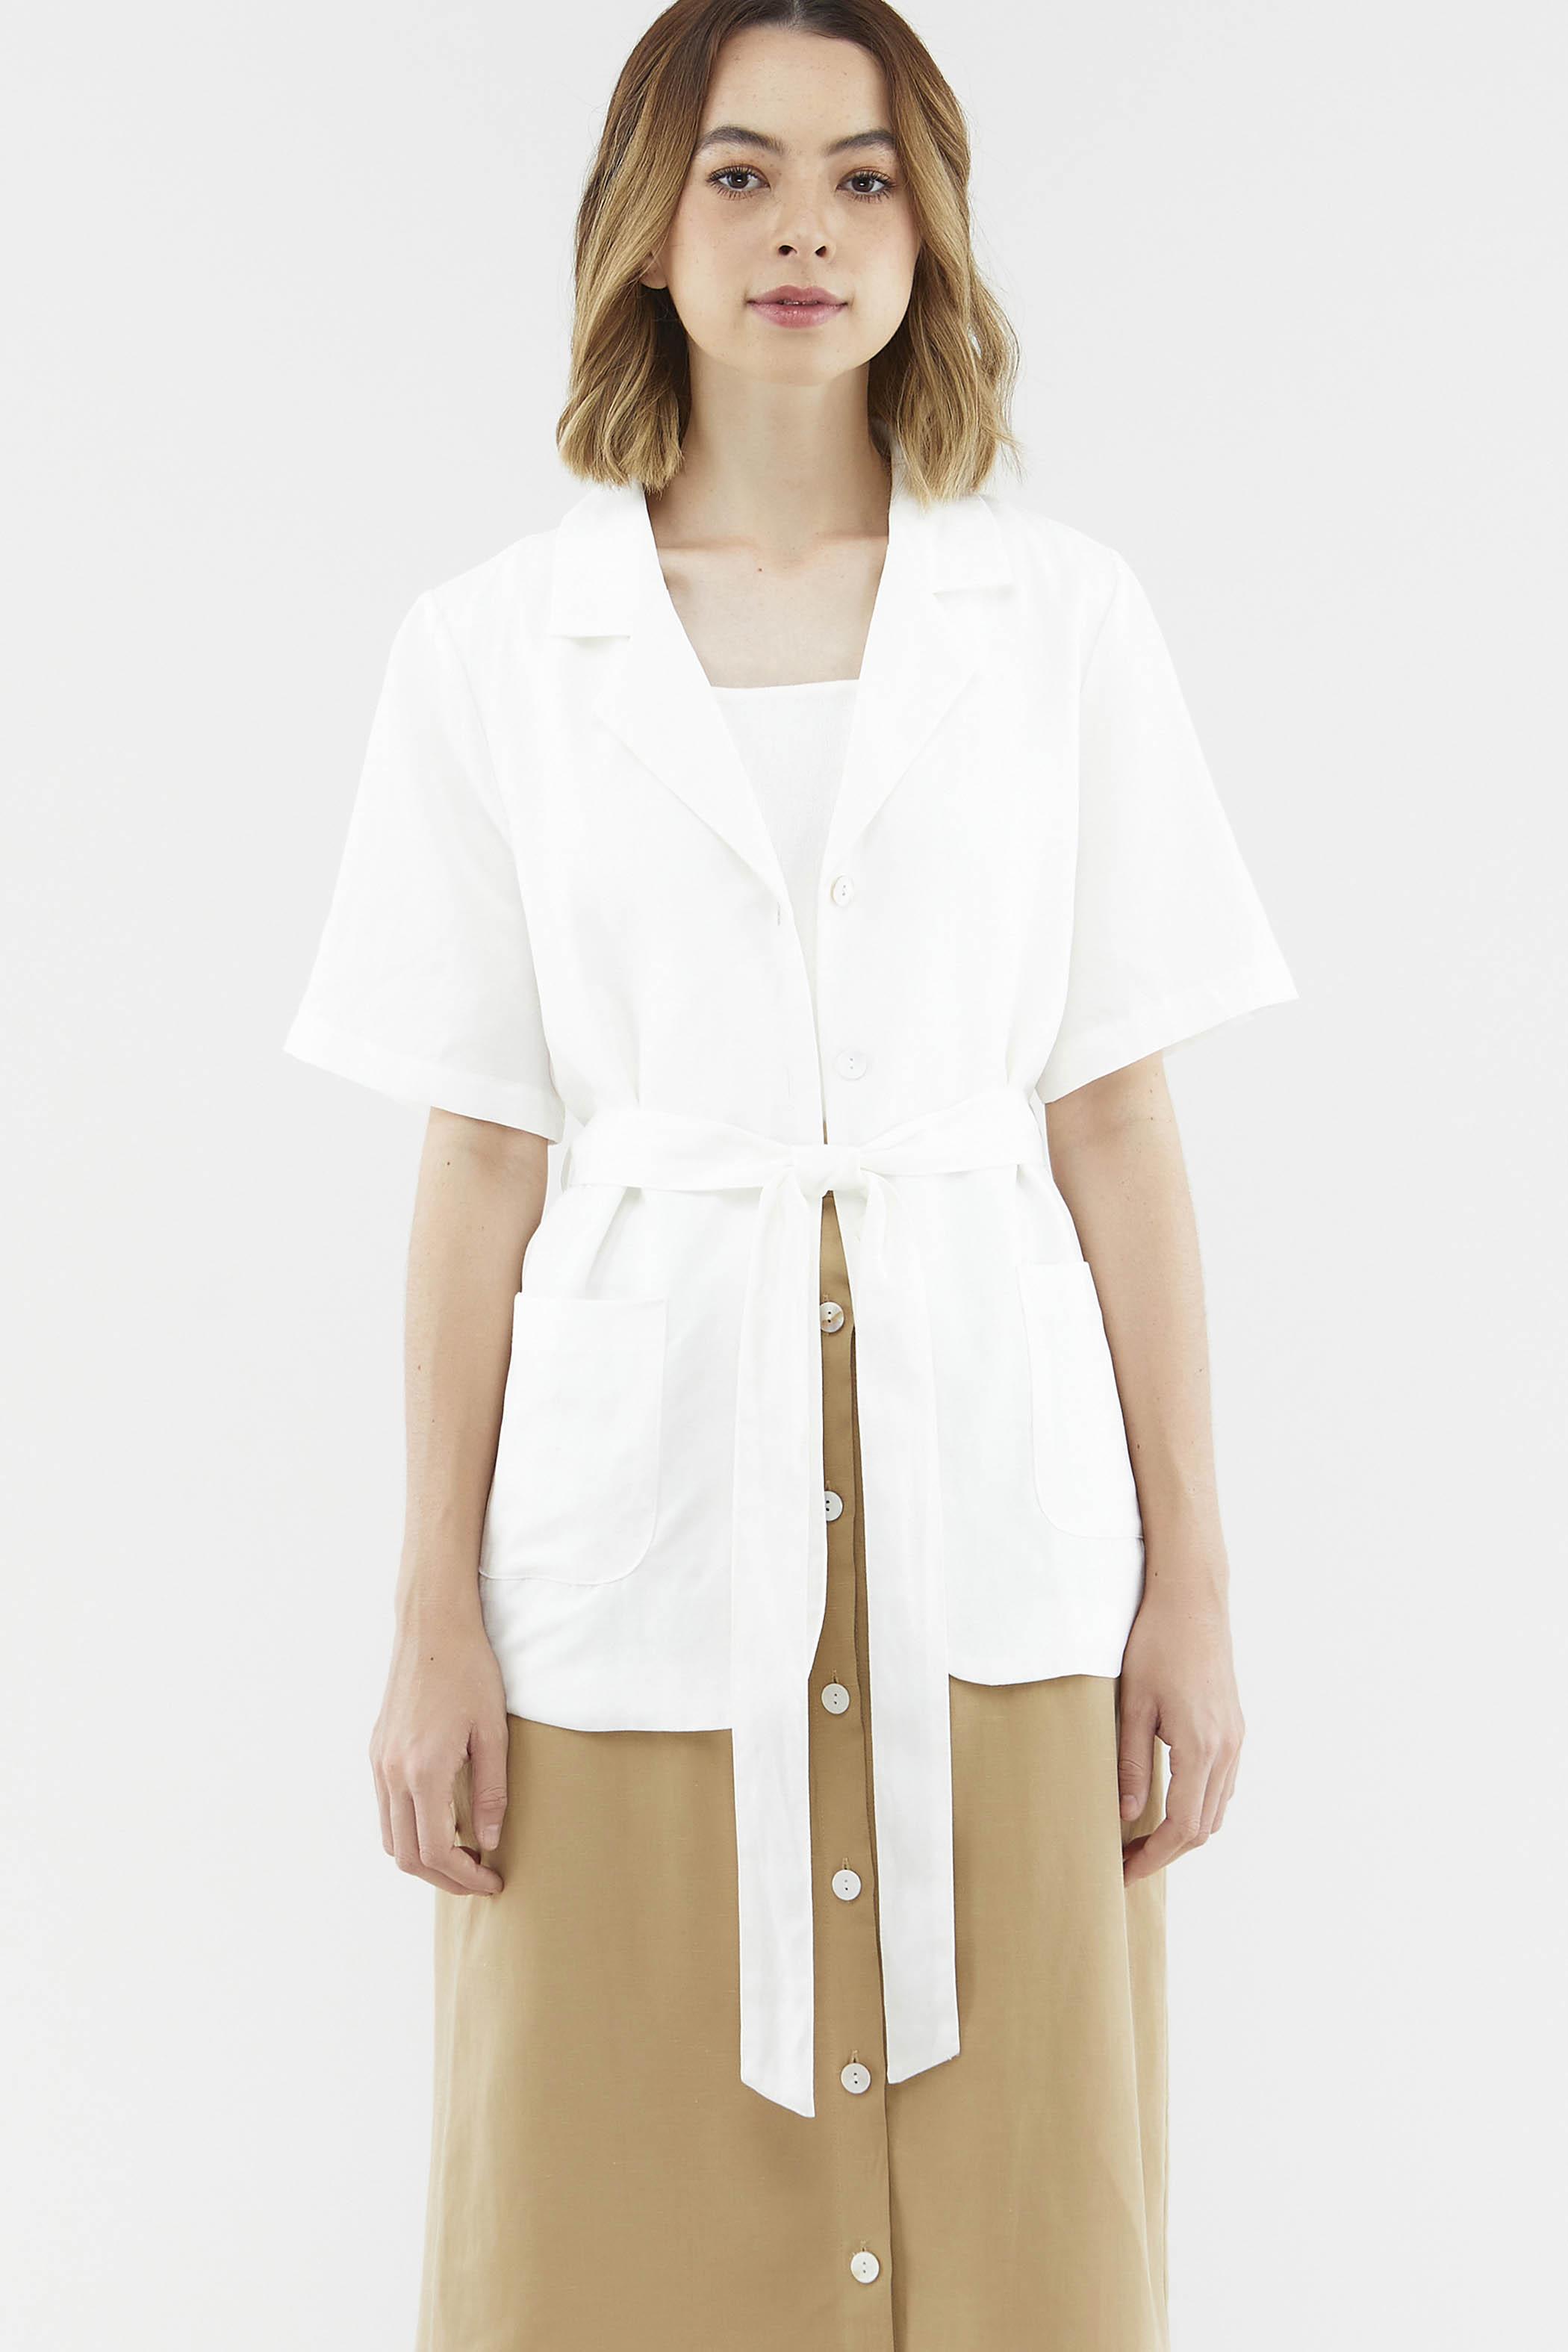 Hillory Short-Sleeve Blazer